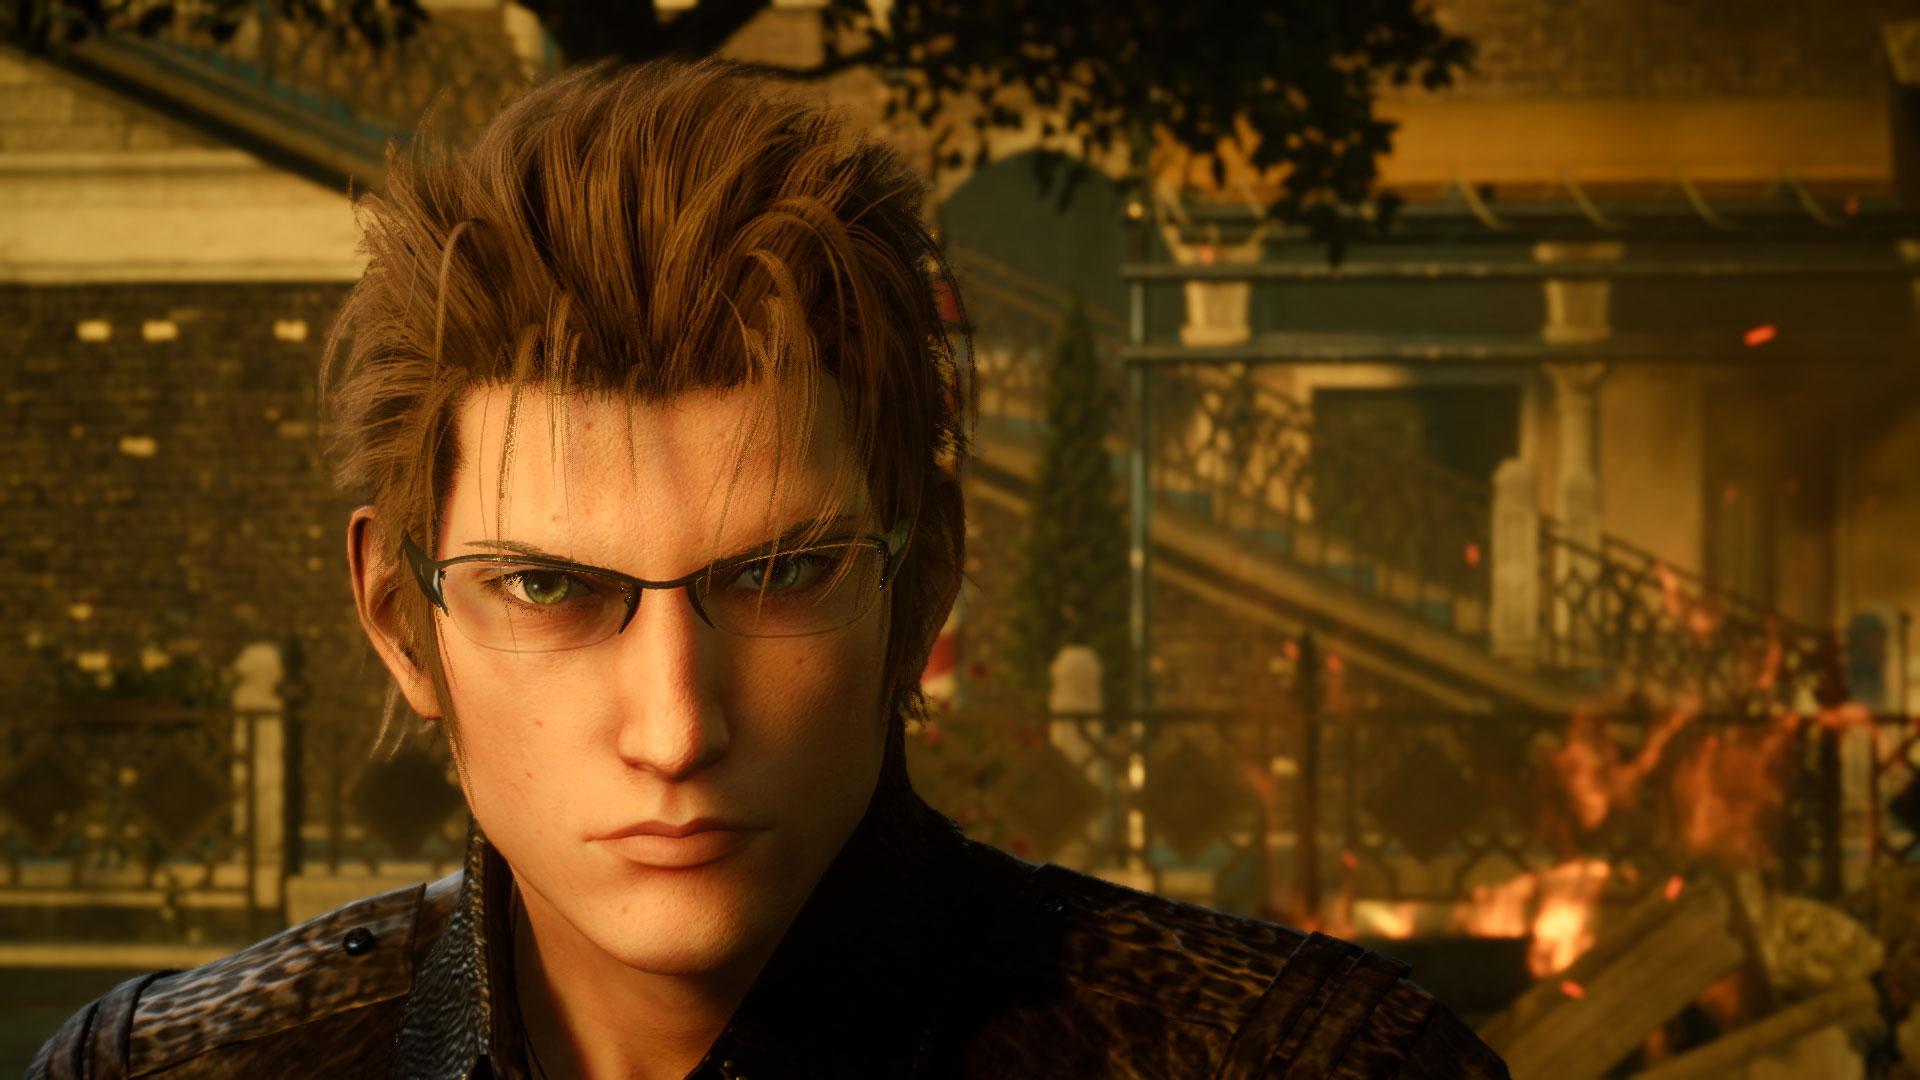 Final Fantasy XV: Episode Ignis - X35 Earthwalker